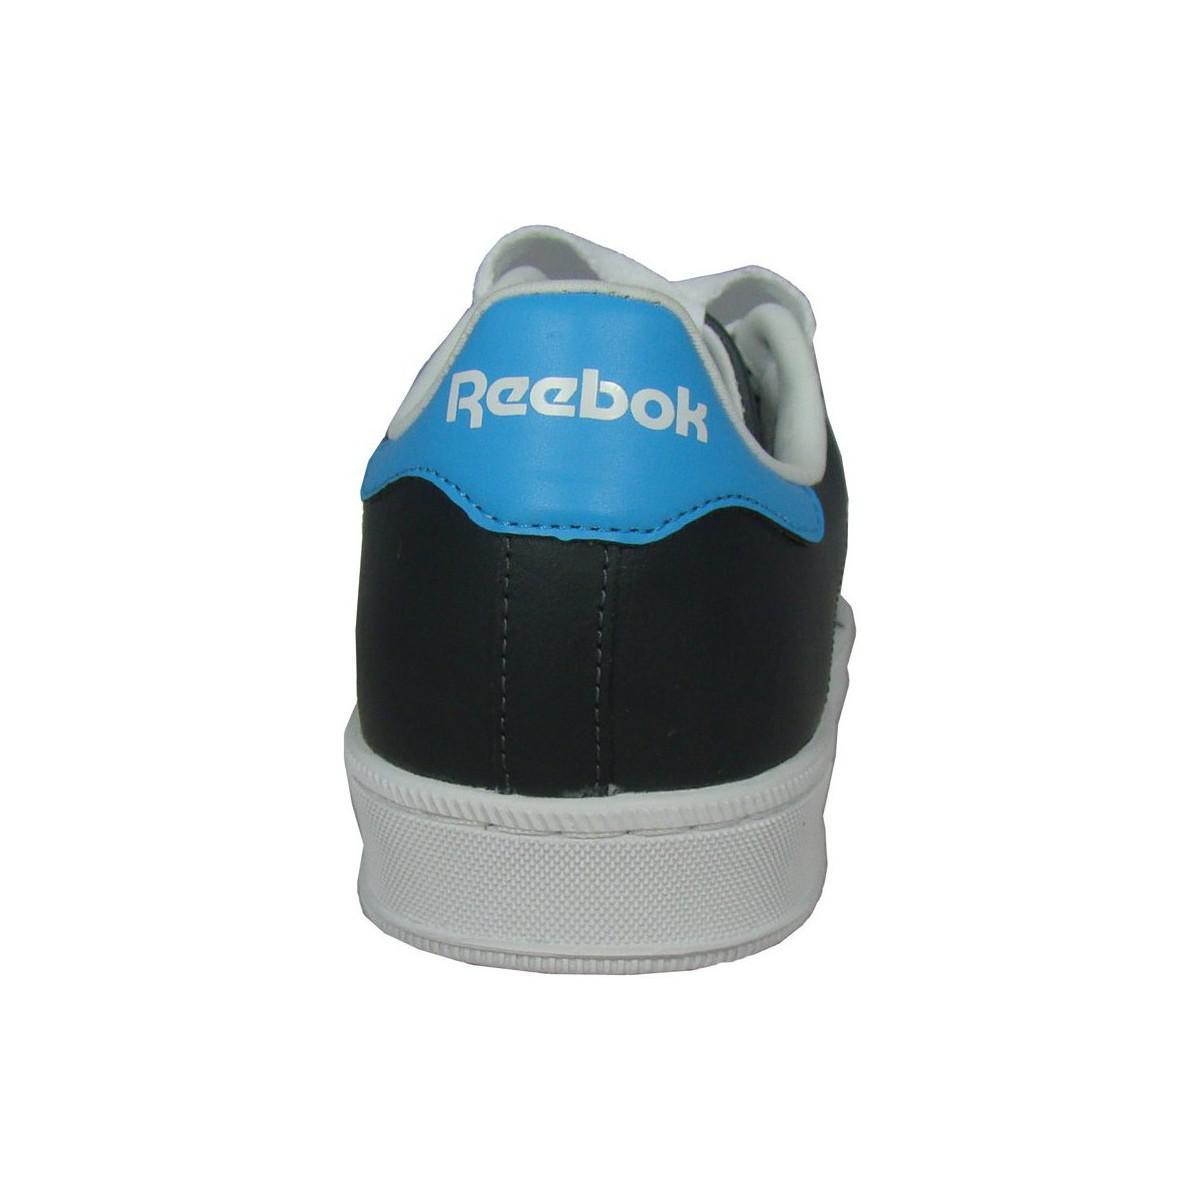 Reebok Royal Belief Men's Shoes (trainers) In Multicolour for Men